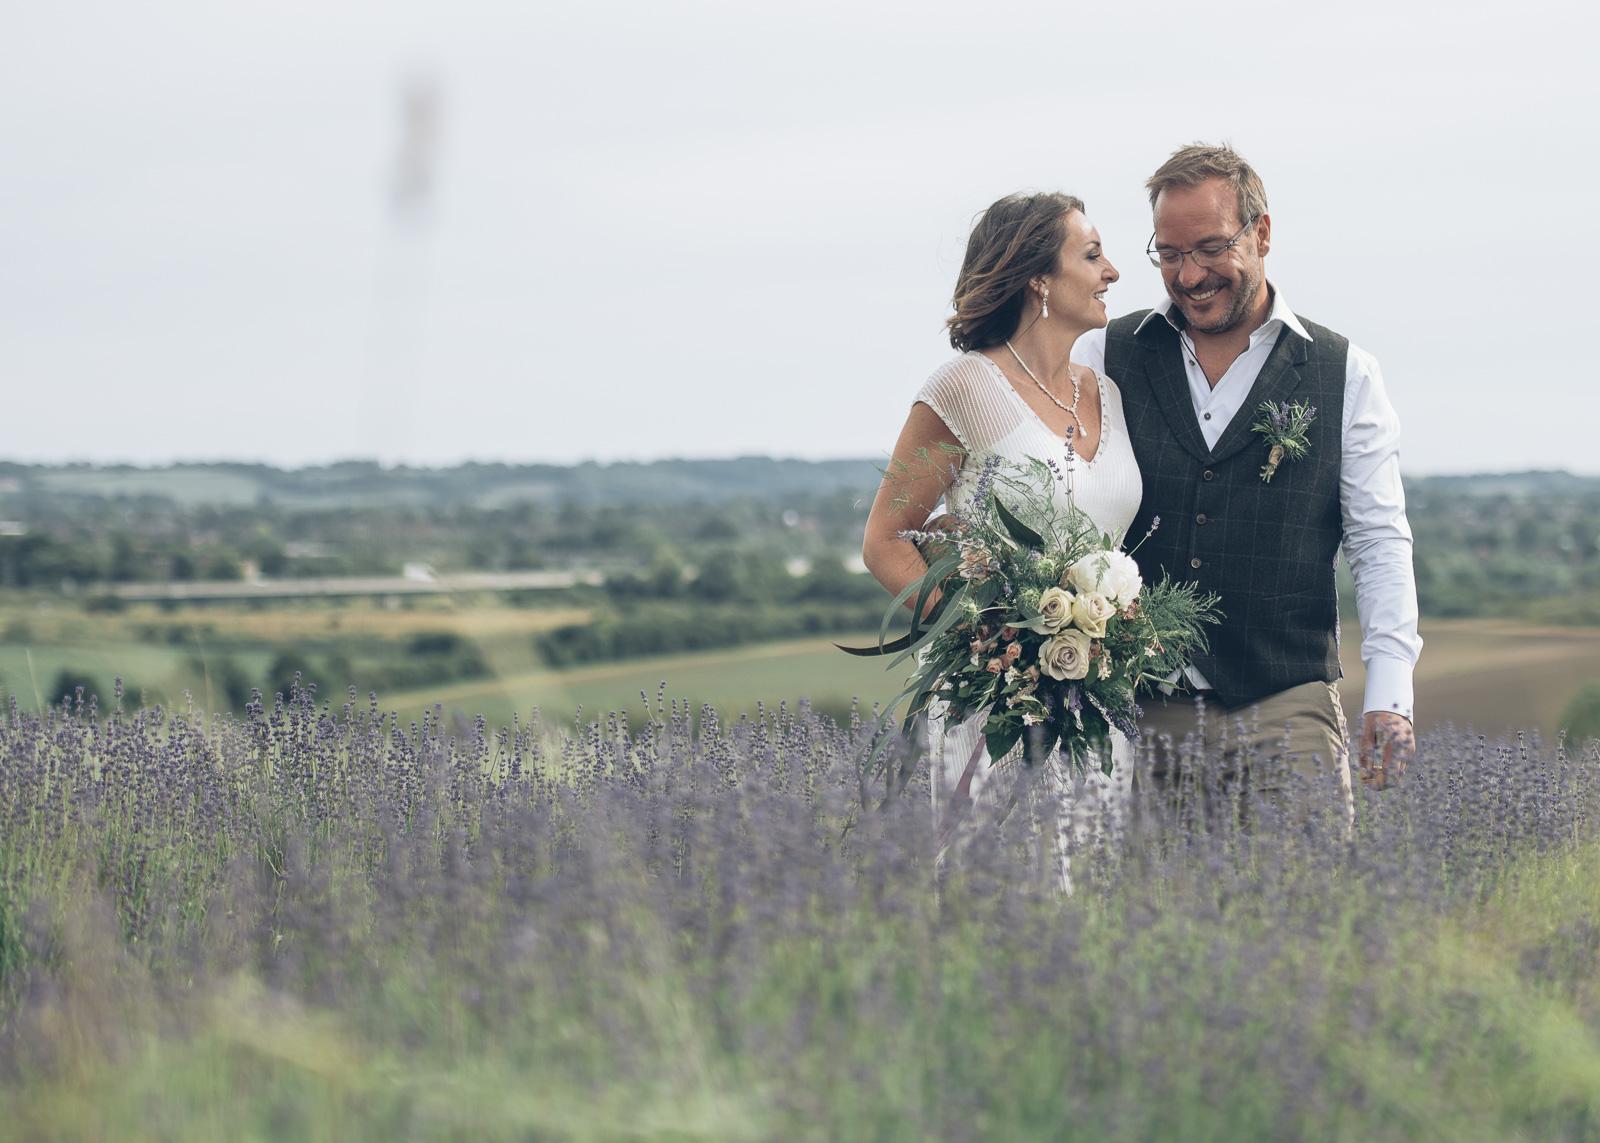 032 Wedding Photographer Hitchin © Erica Hawkins Photography